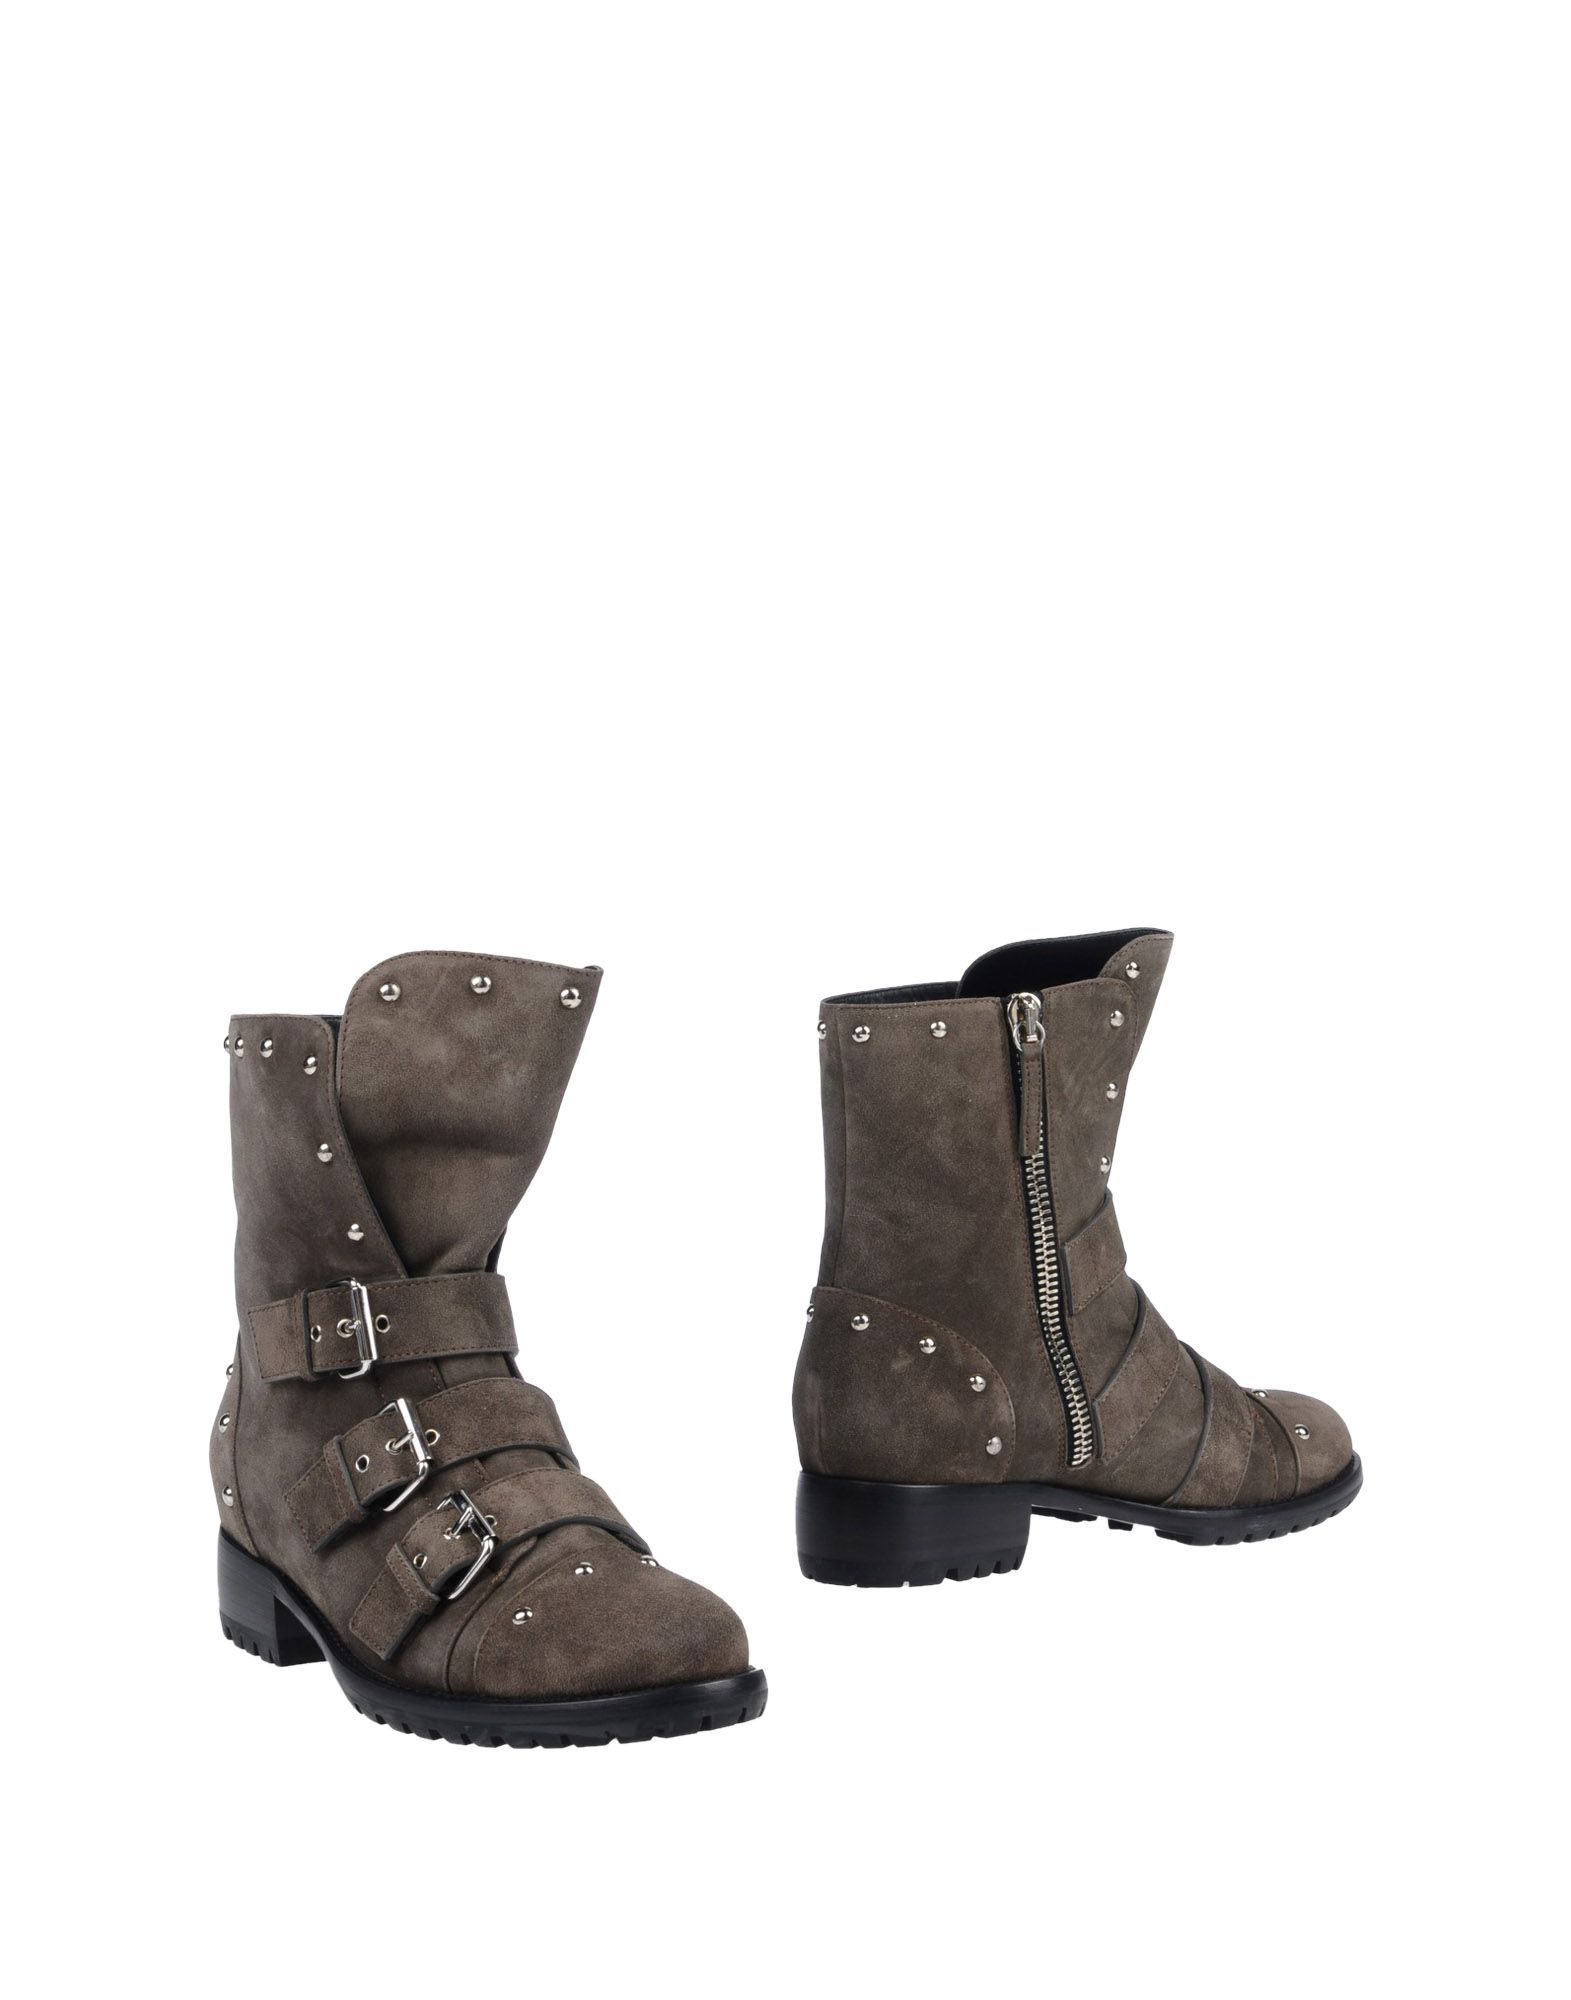 Giuseppe Zanotti Grey Ankle Boots